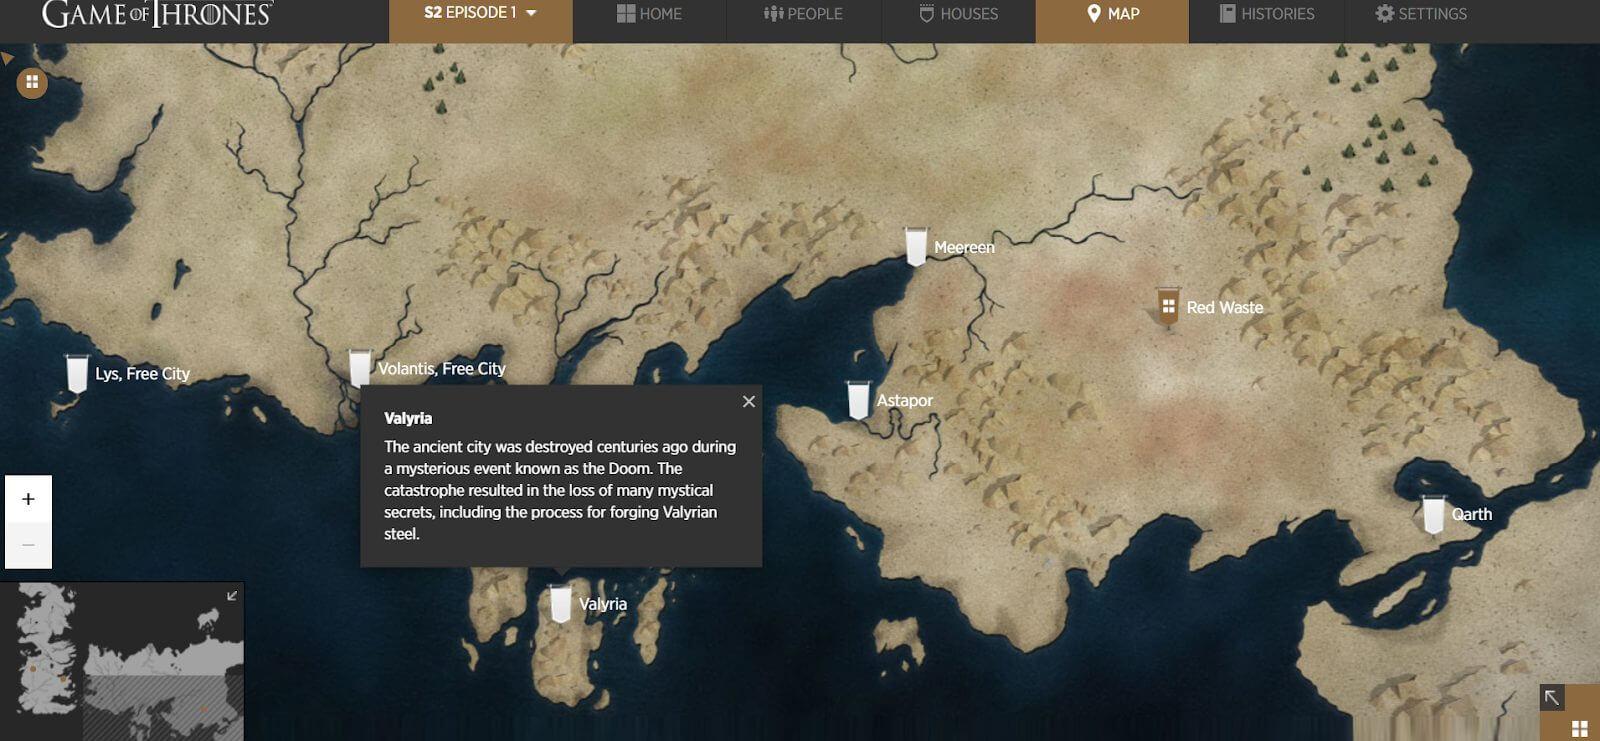 GoT Interactive Web Design Video